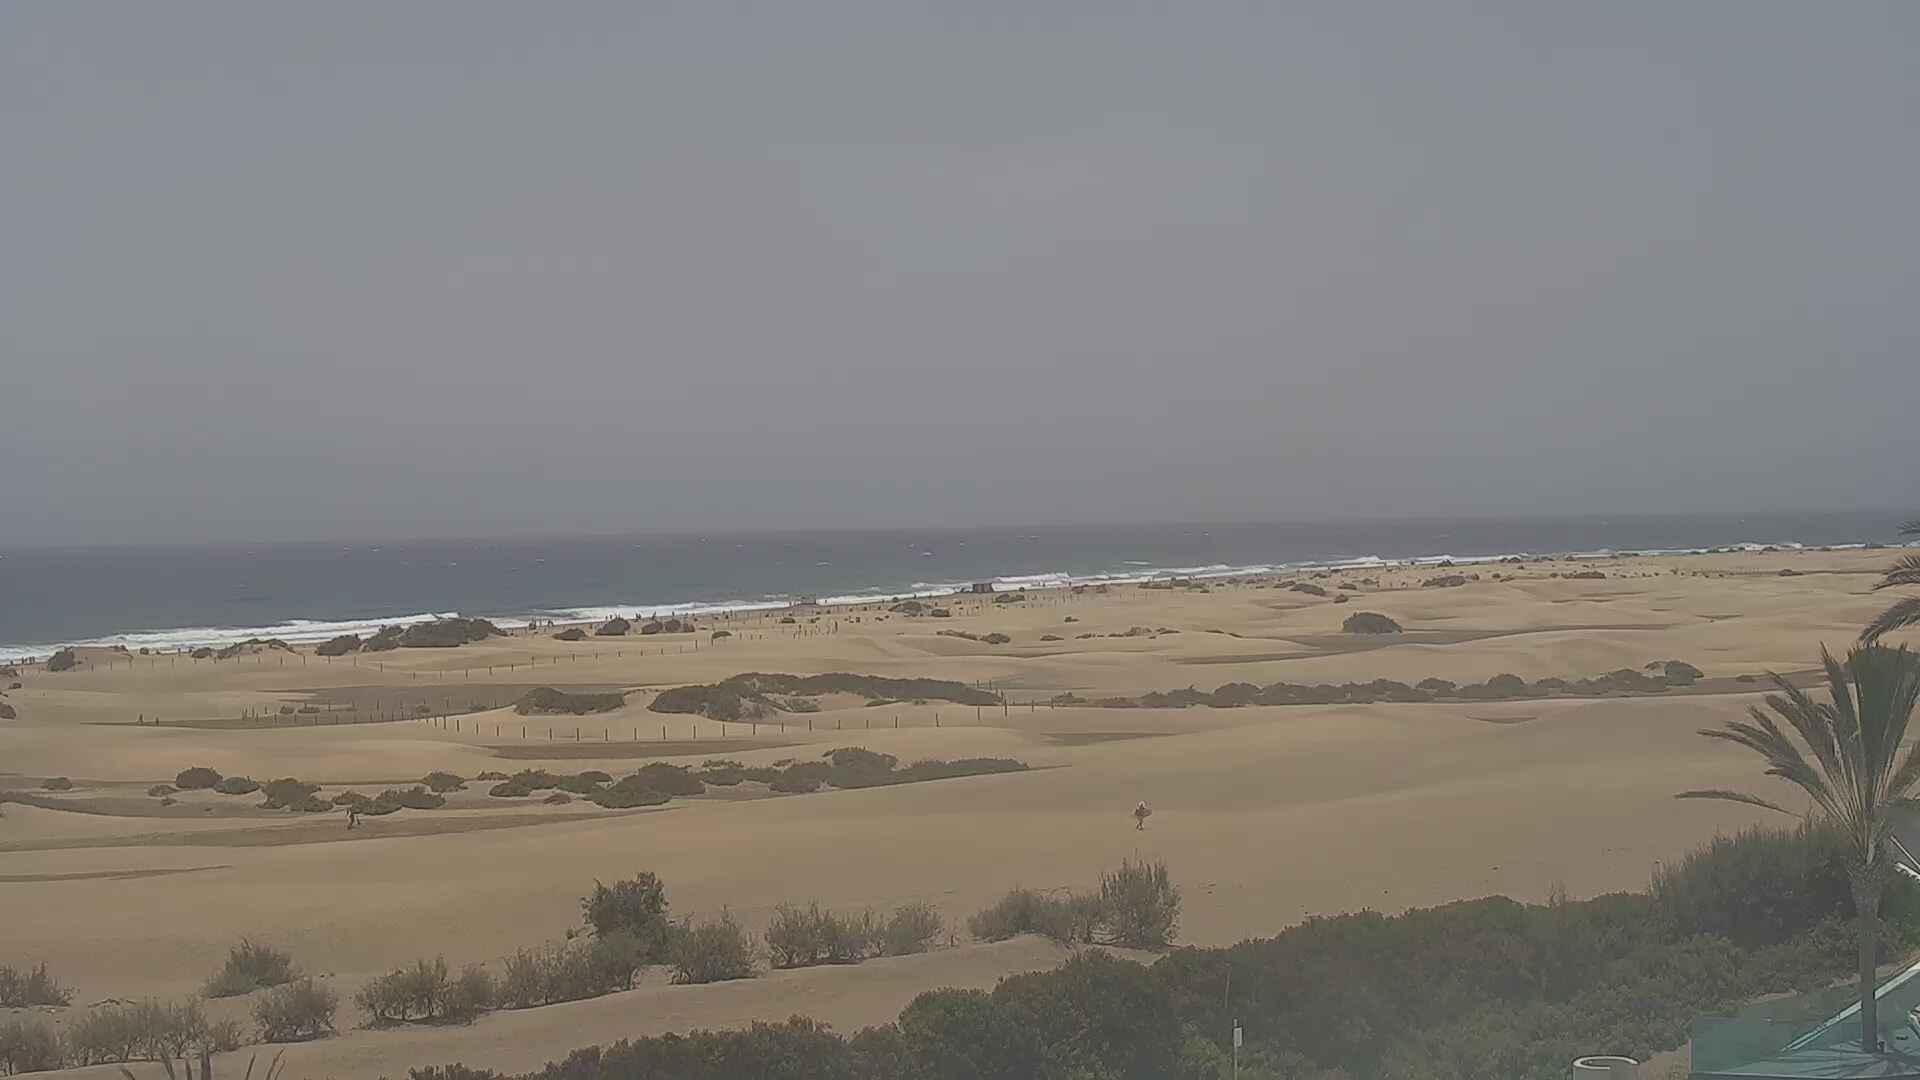 Playa del Ingles (Gran Canaria) Sat. 13:36